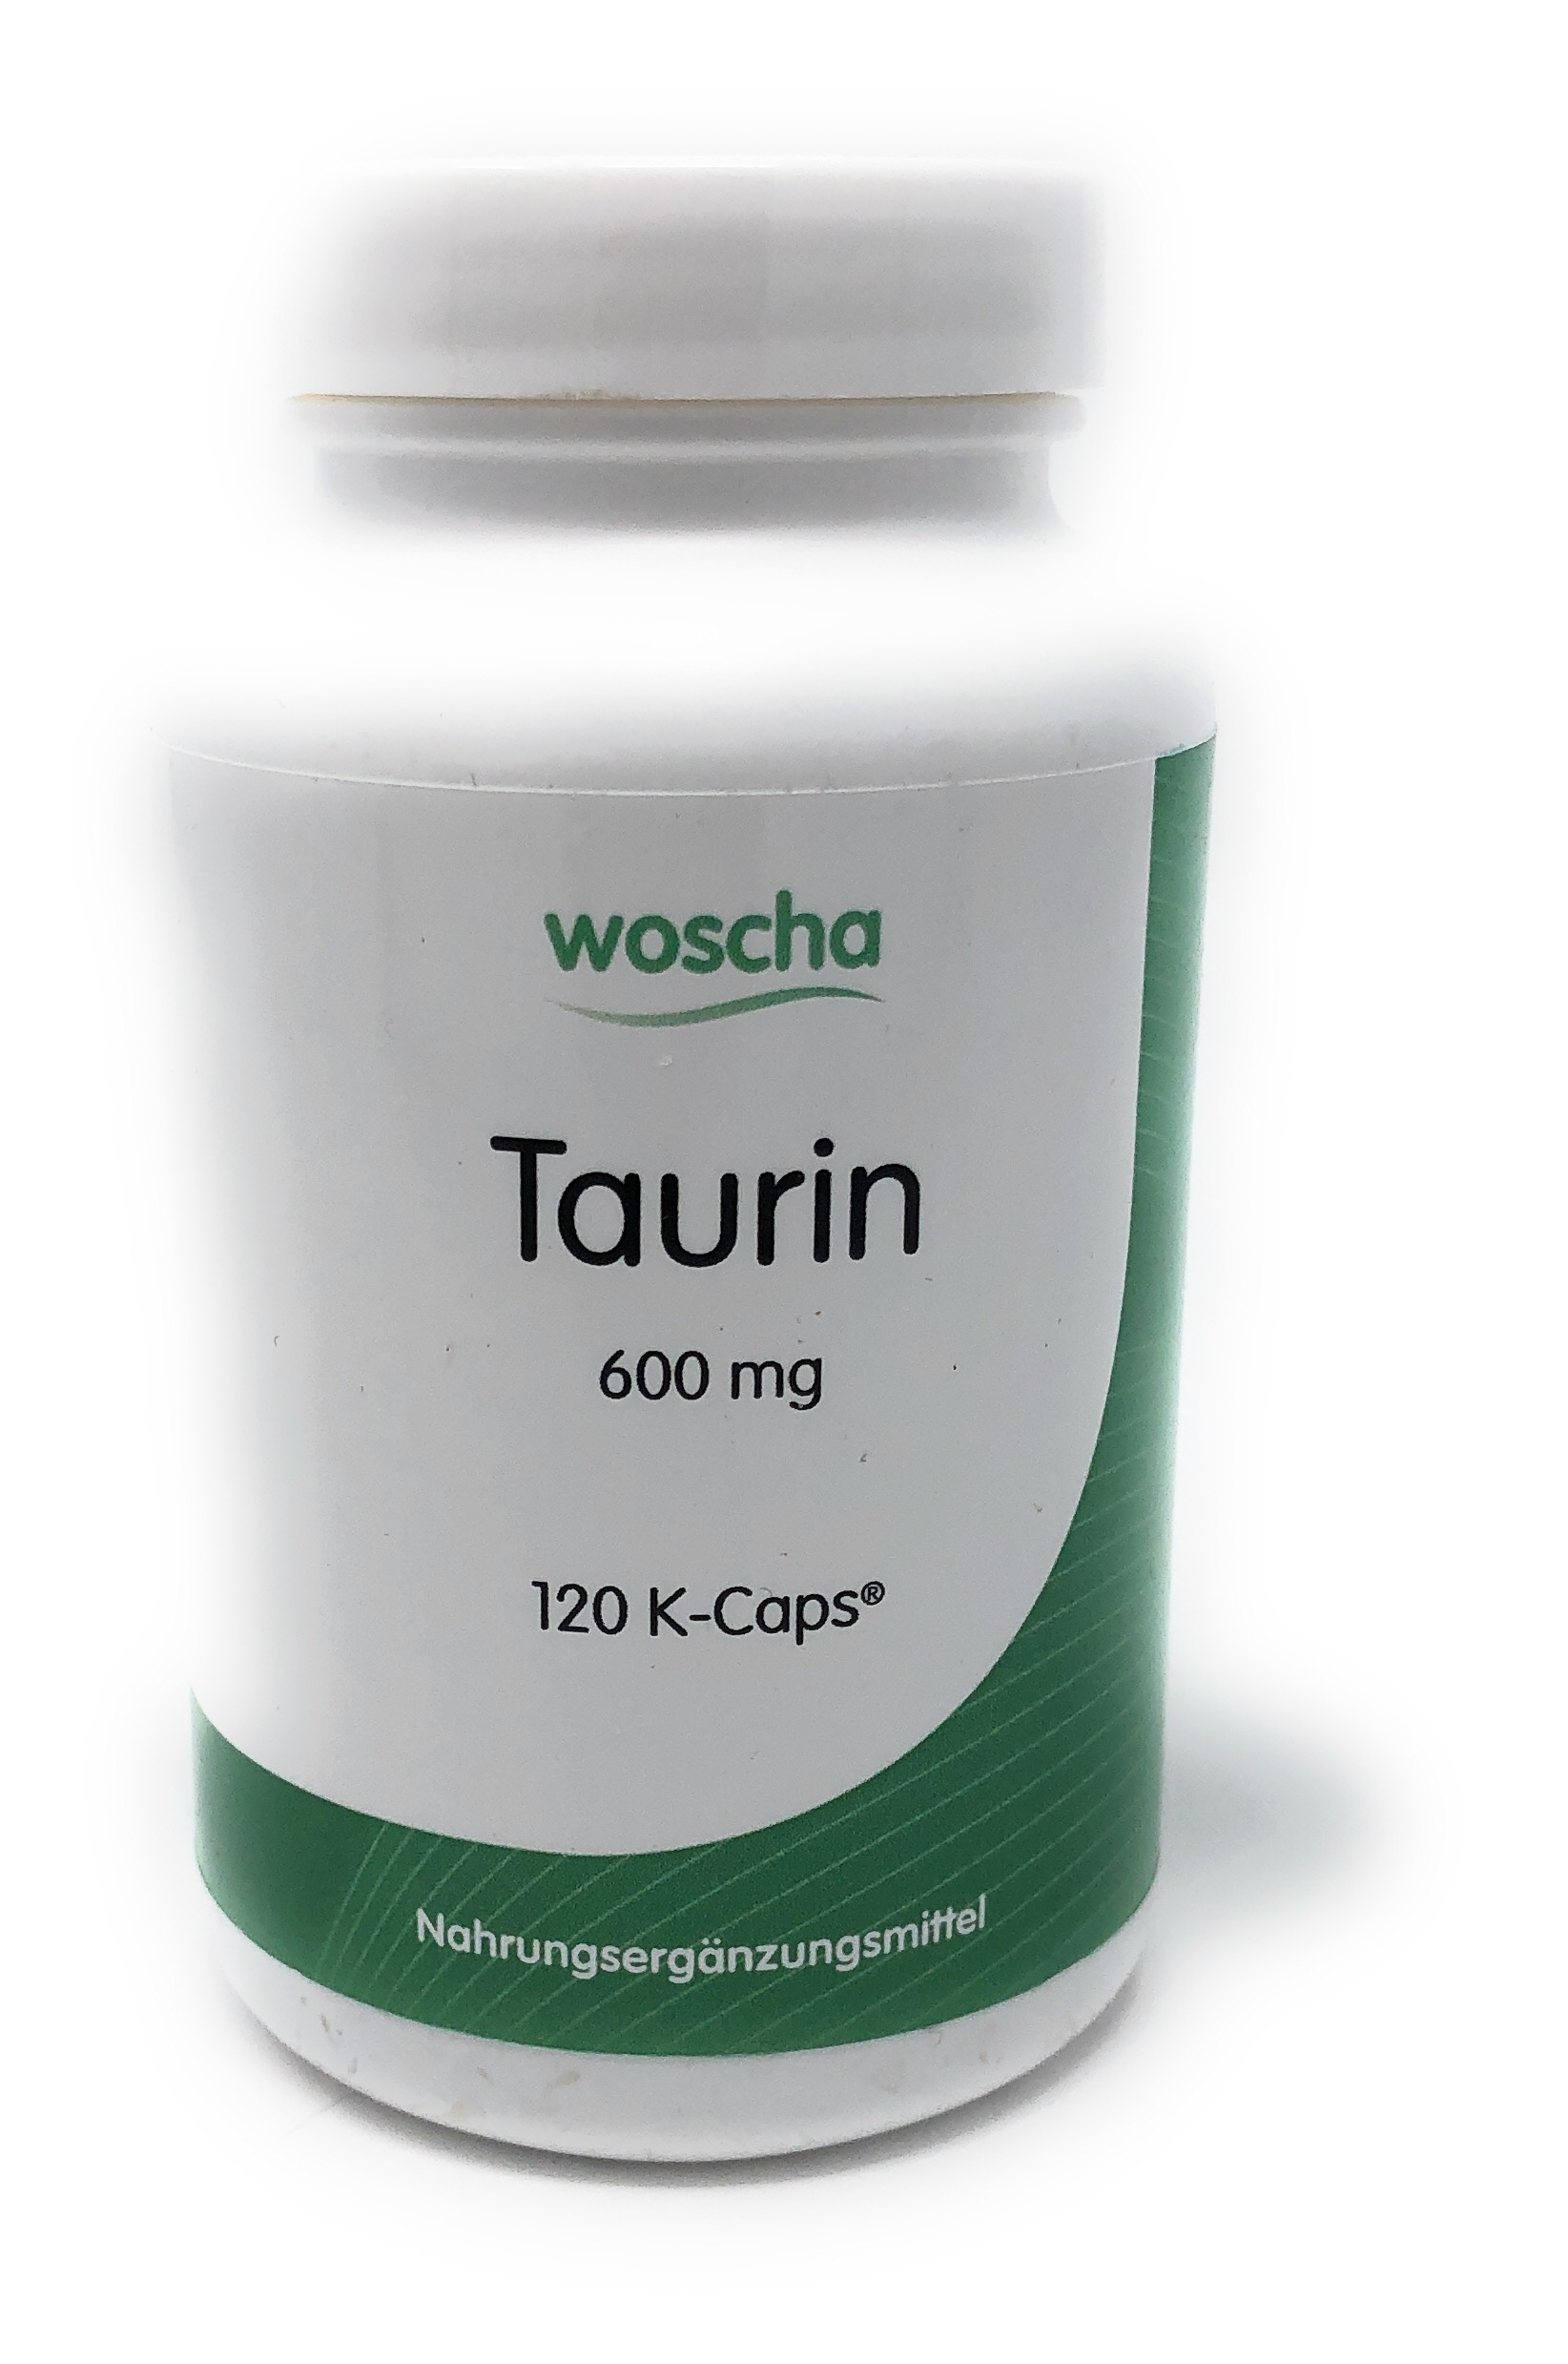 woscha Taurin 600mg 120 K-CAPS® (vegan)(100g)